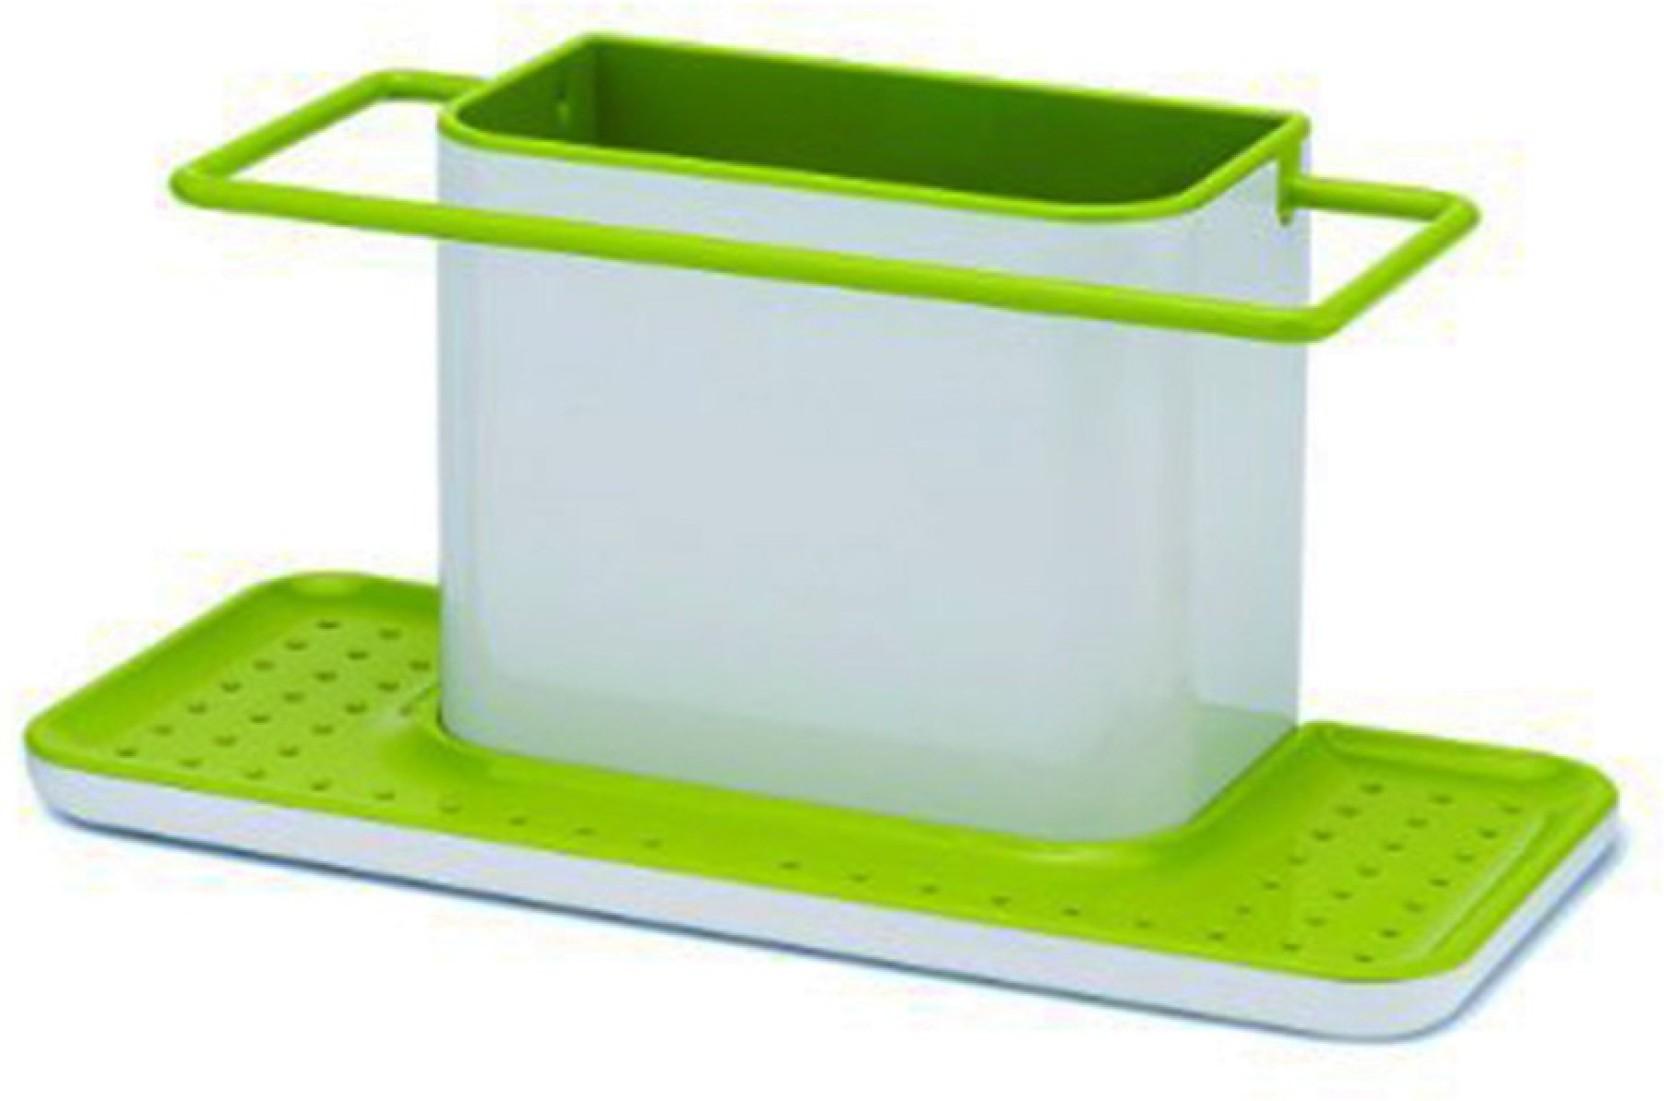 Komfort Kitchen Sink Organiser Rack Sink Sponge Holder Price in ...